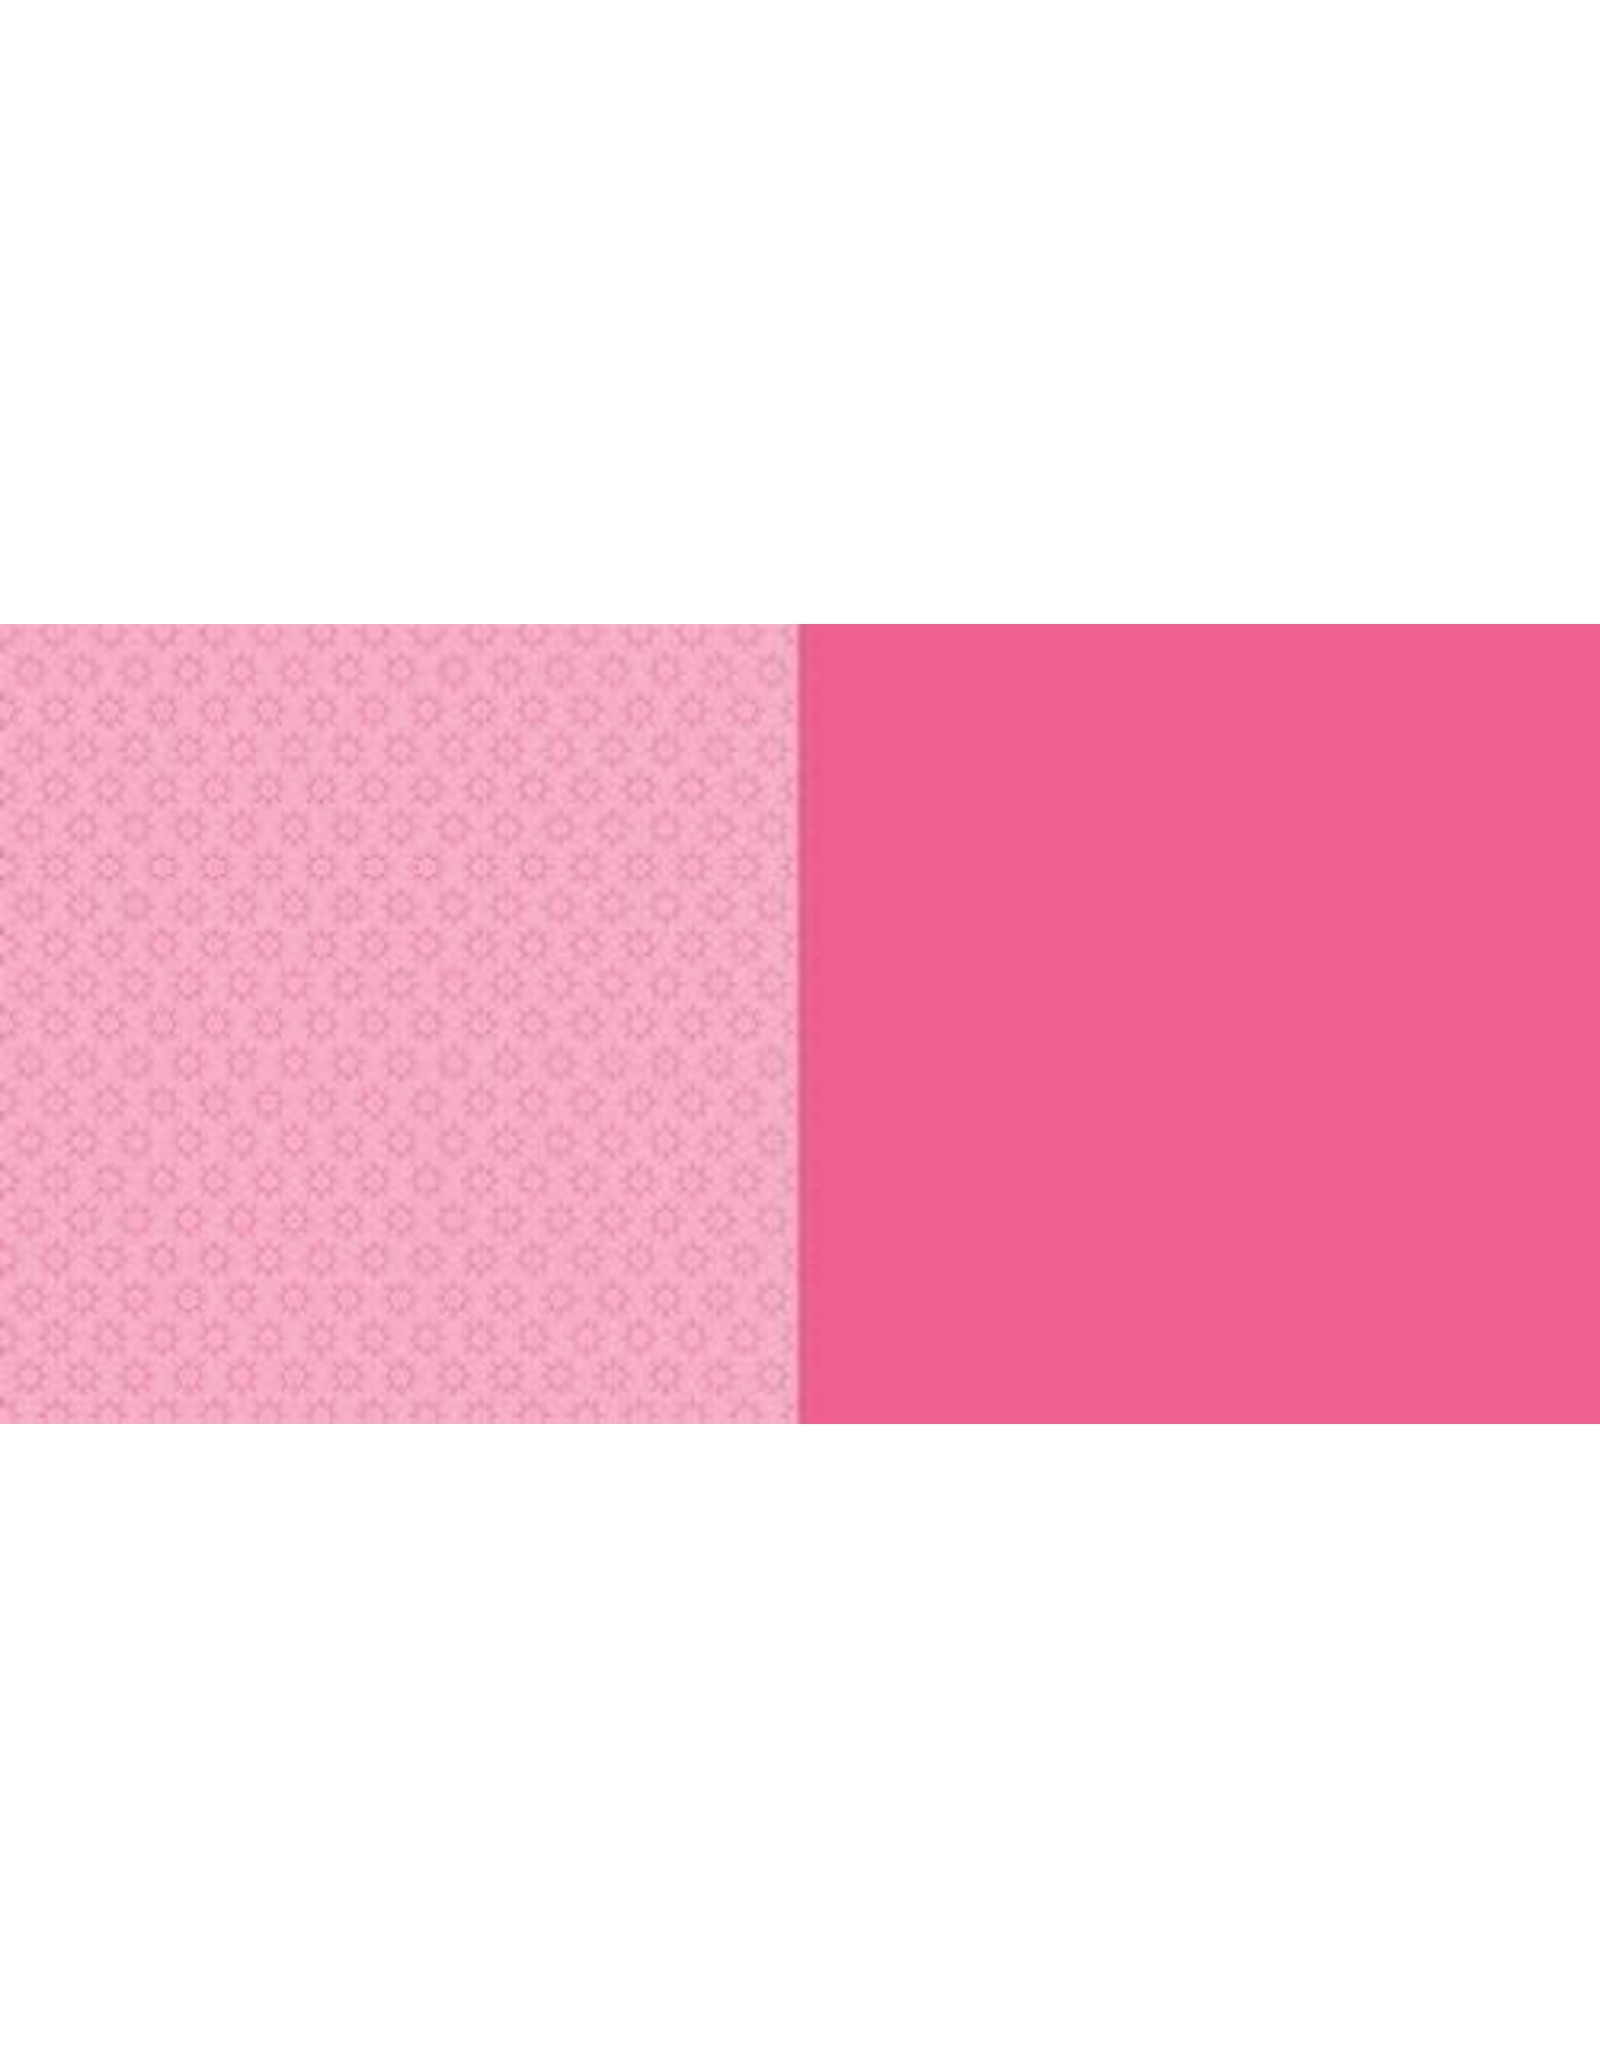 Dini Design Dini Design Scrappapier 10 vl Anker uni - Watermeloen 30,5x30,5cm #3001